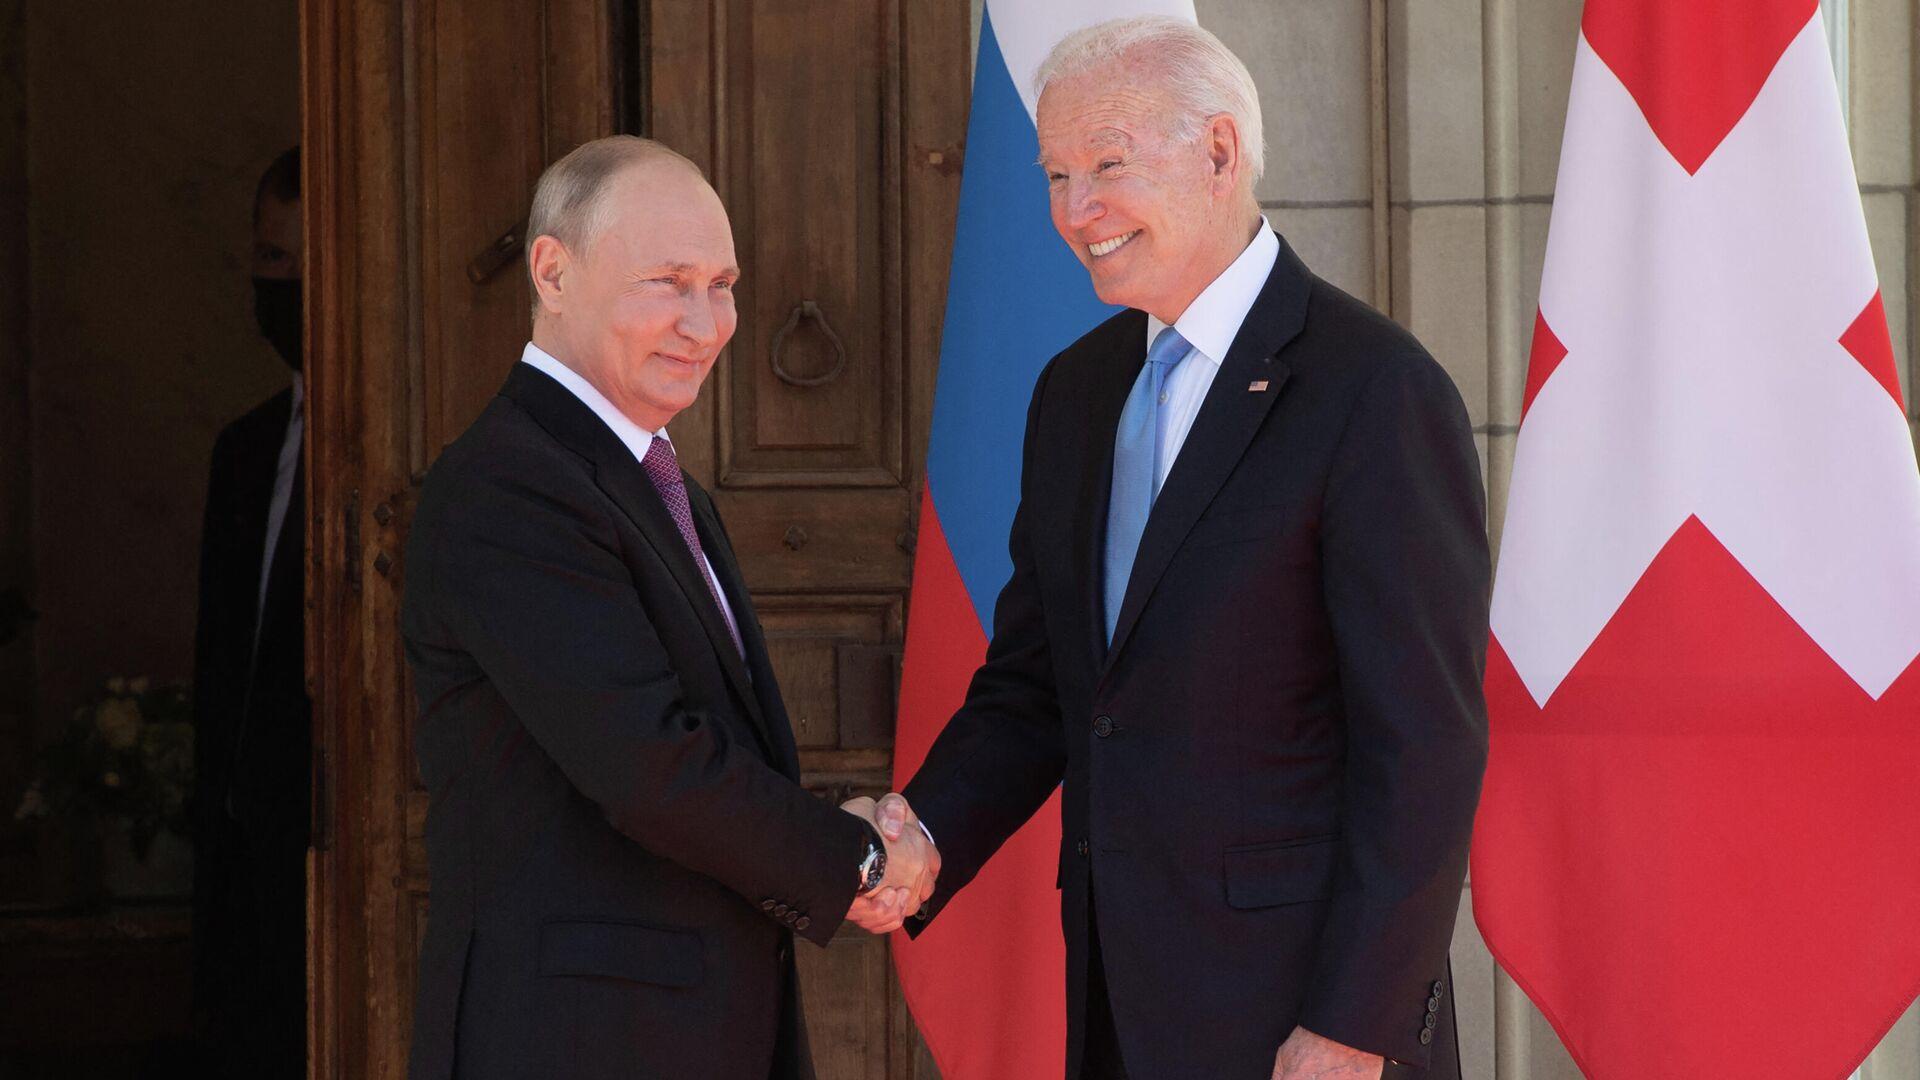 Президент США Джо Байден (справа) и президент России Владимир Путин - Sputnik Таджикистан, 1920, 16.06.2021